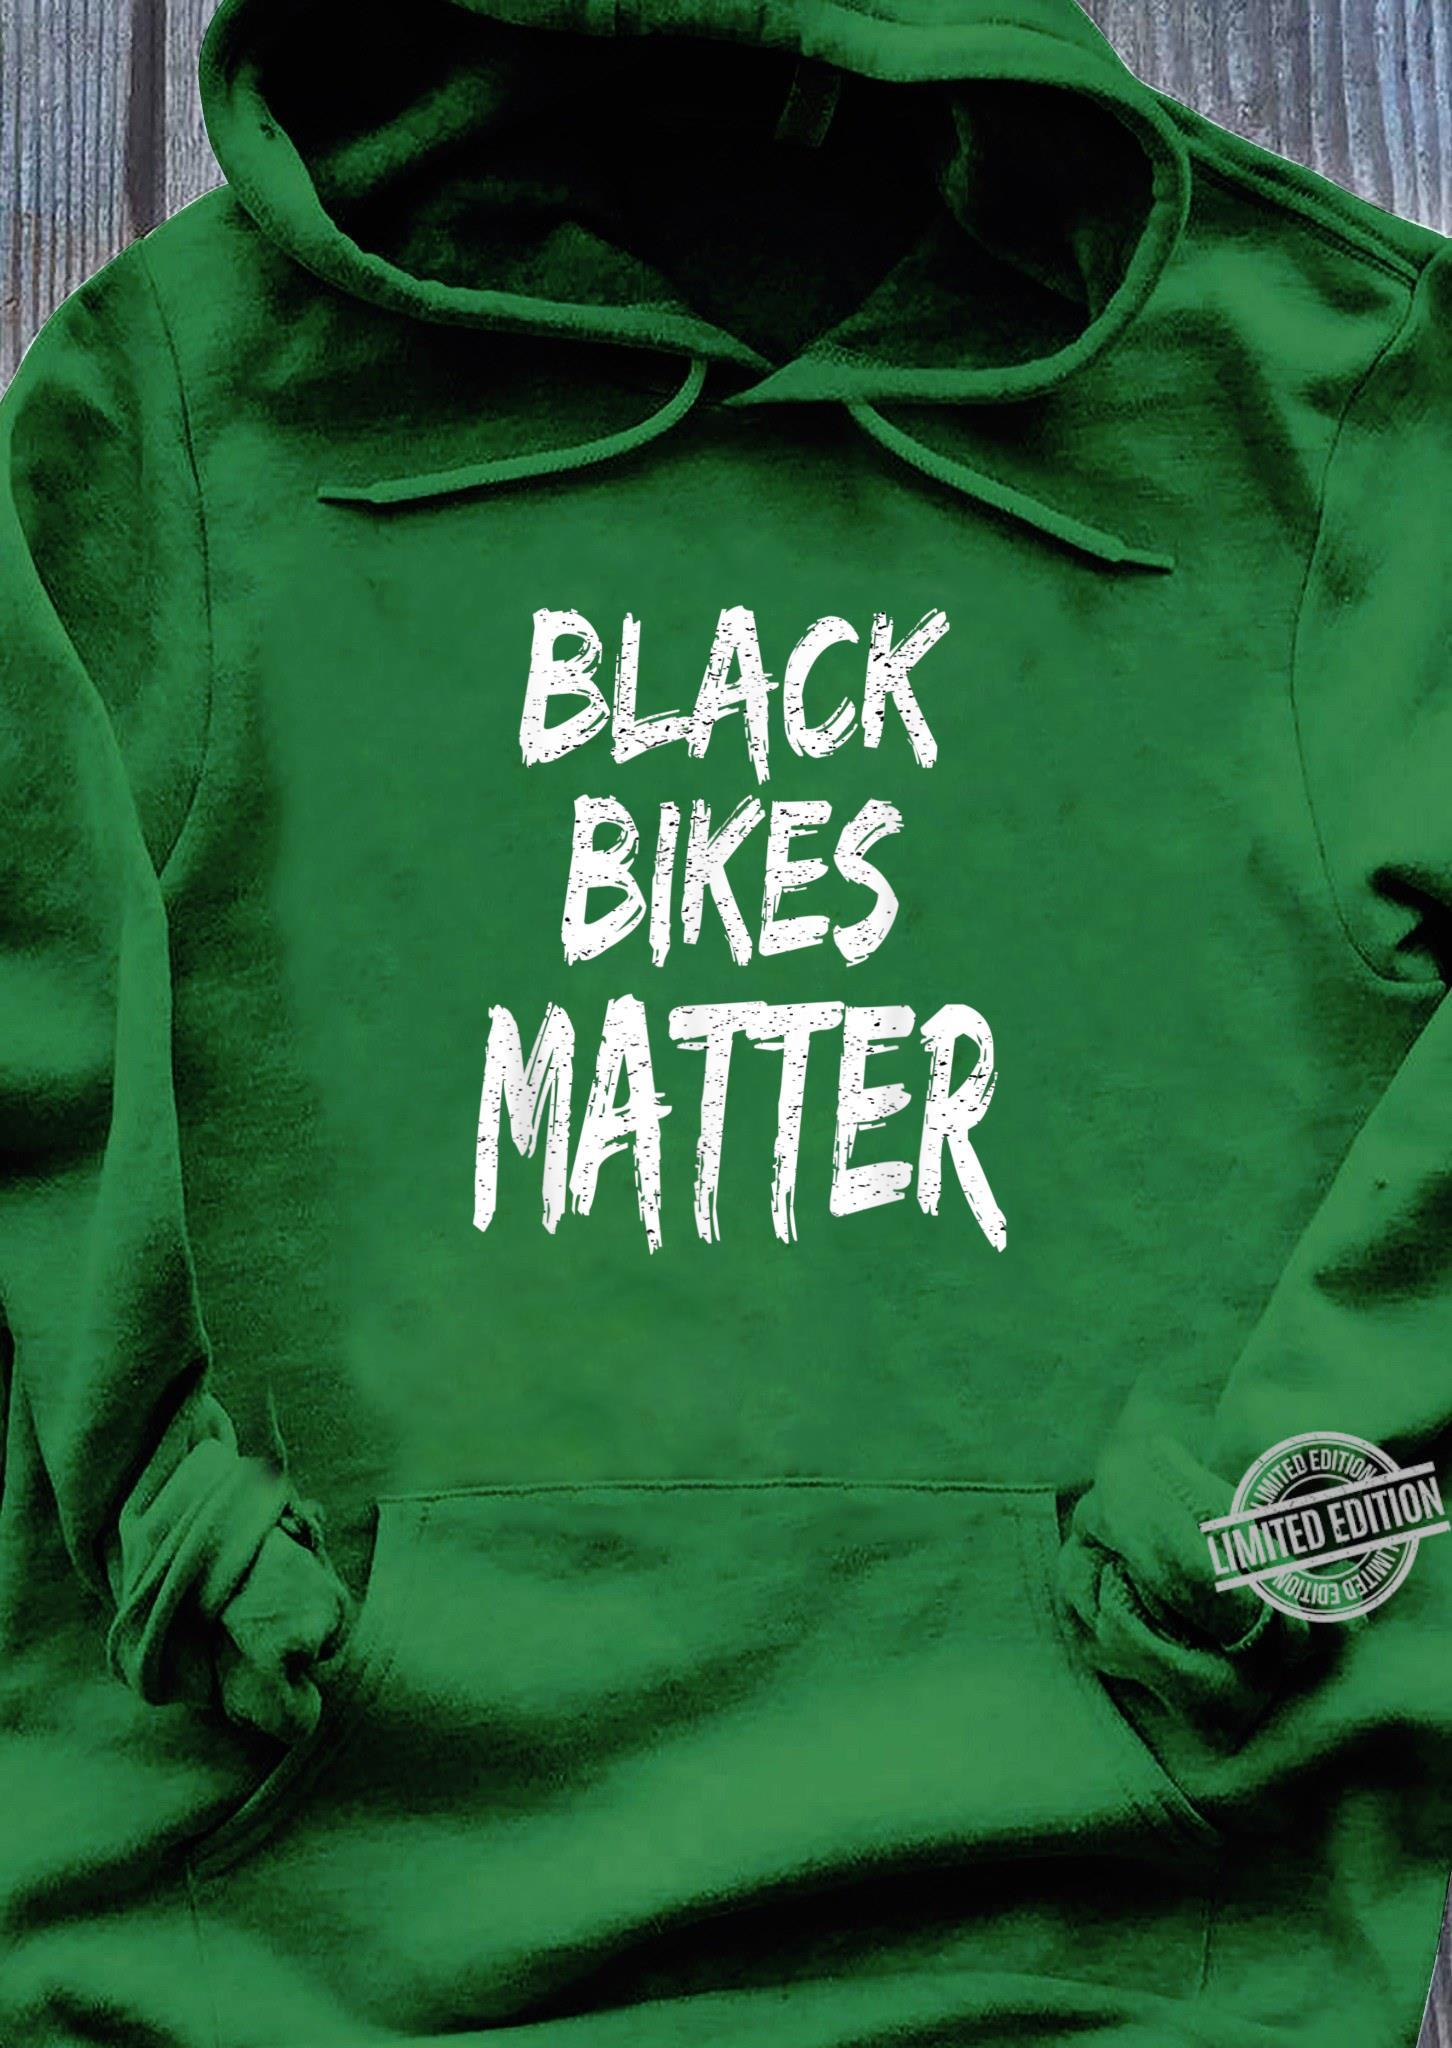 Funny Black Bikes Matter Motorcycle Biker Shirt hoodie